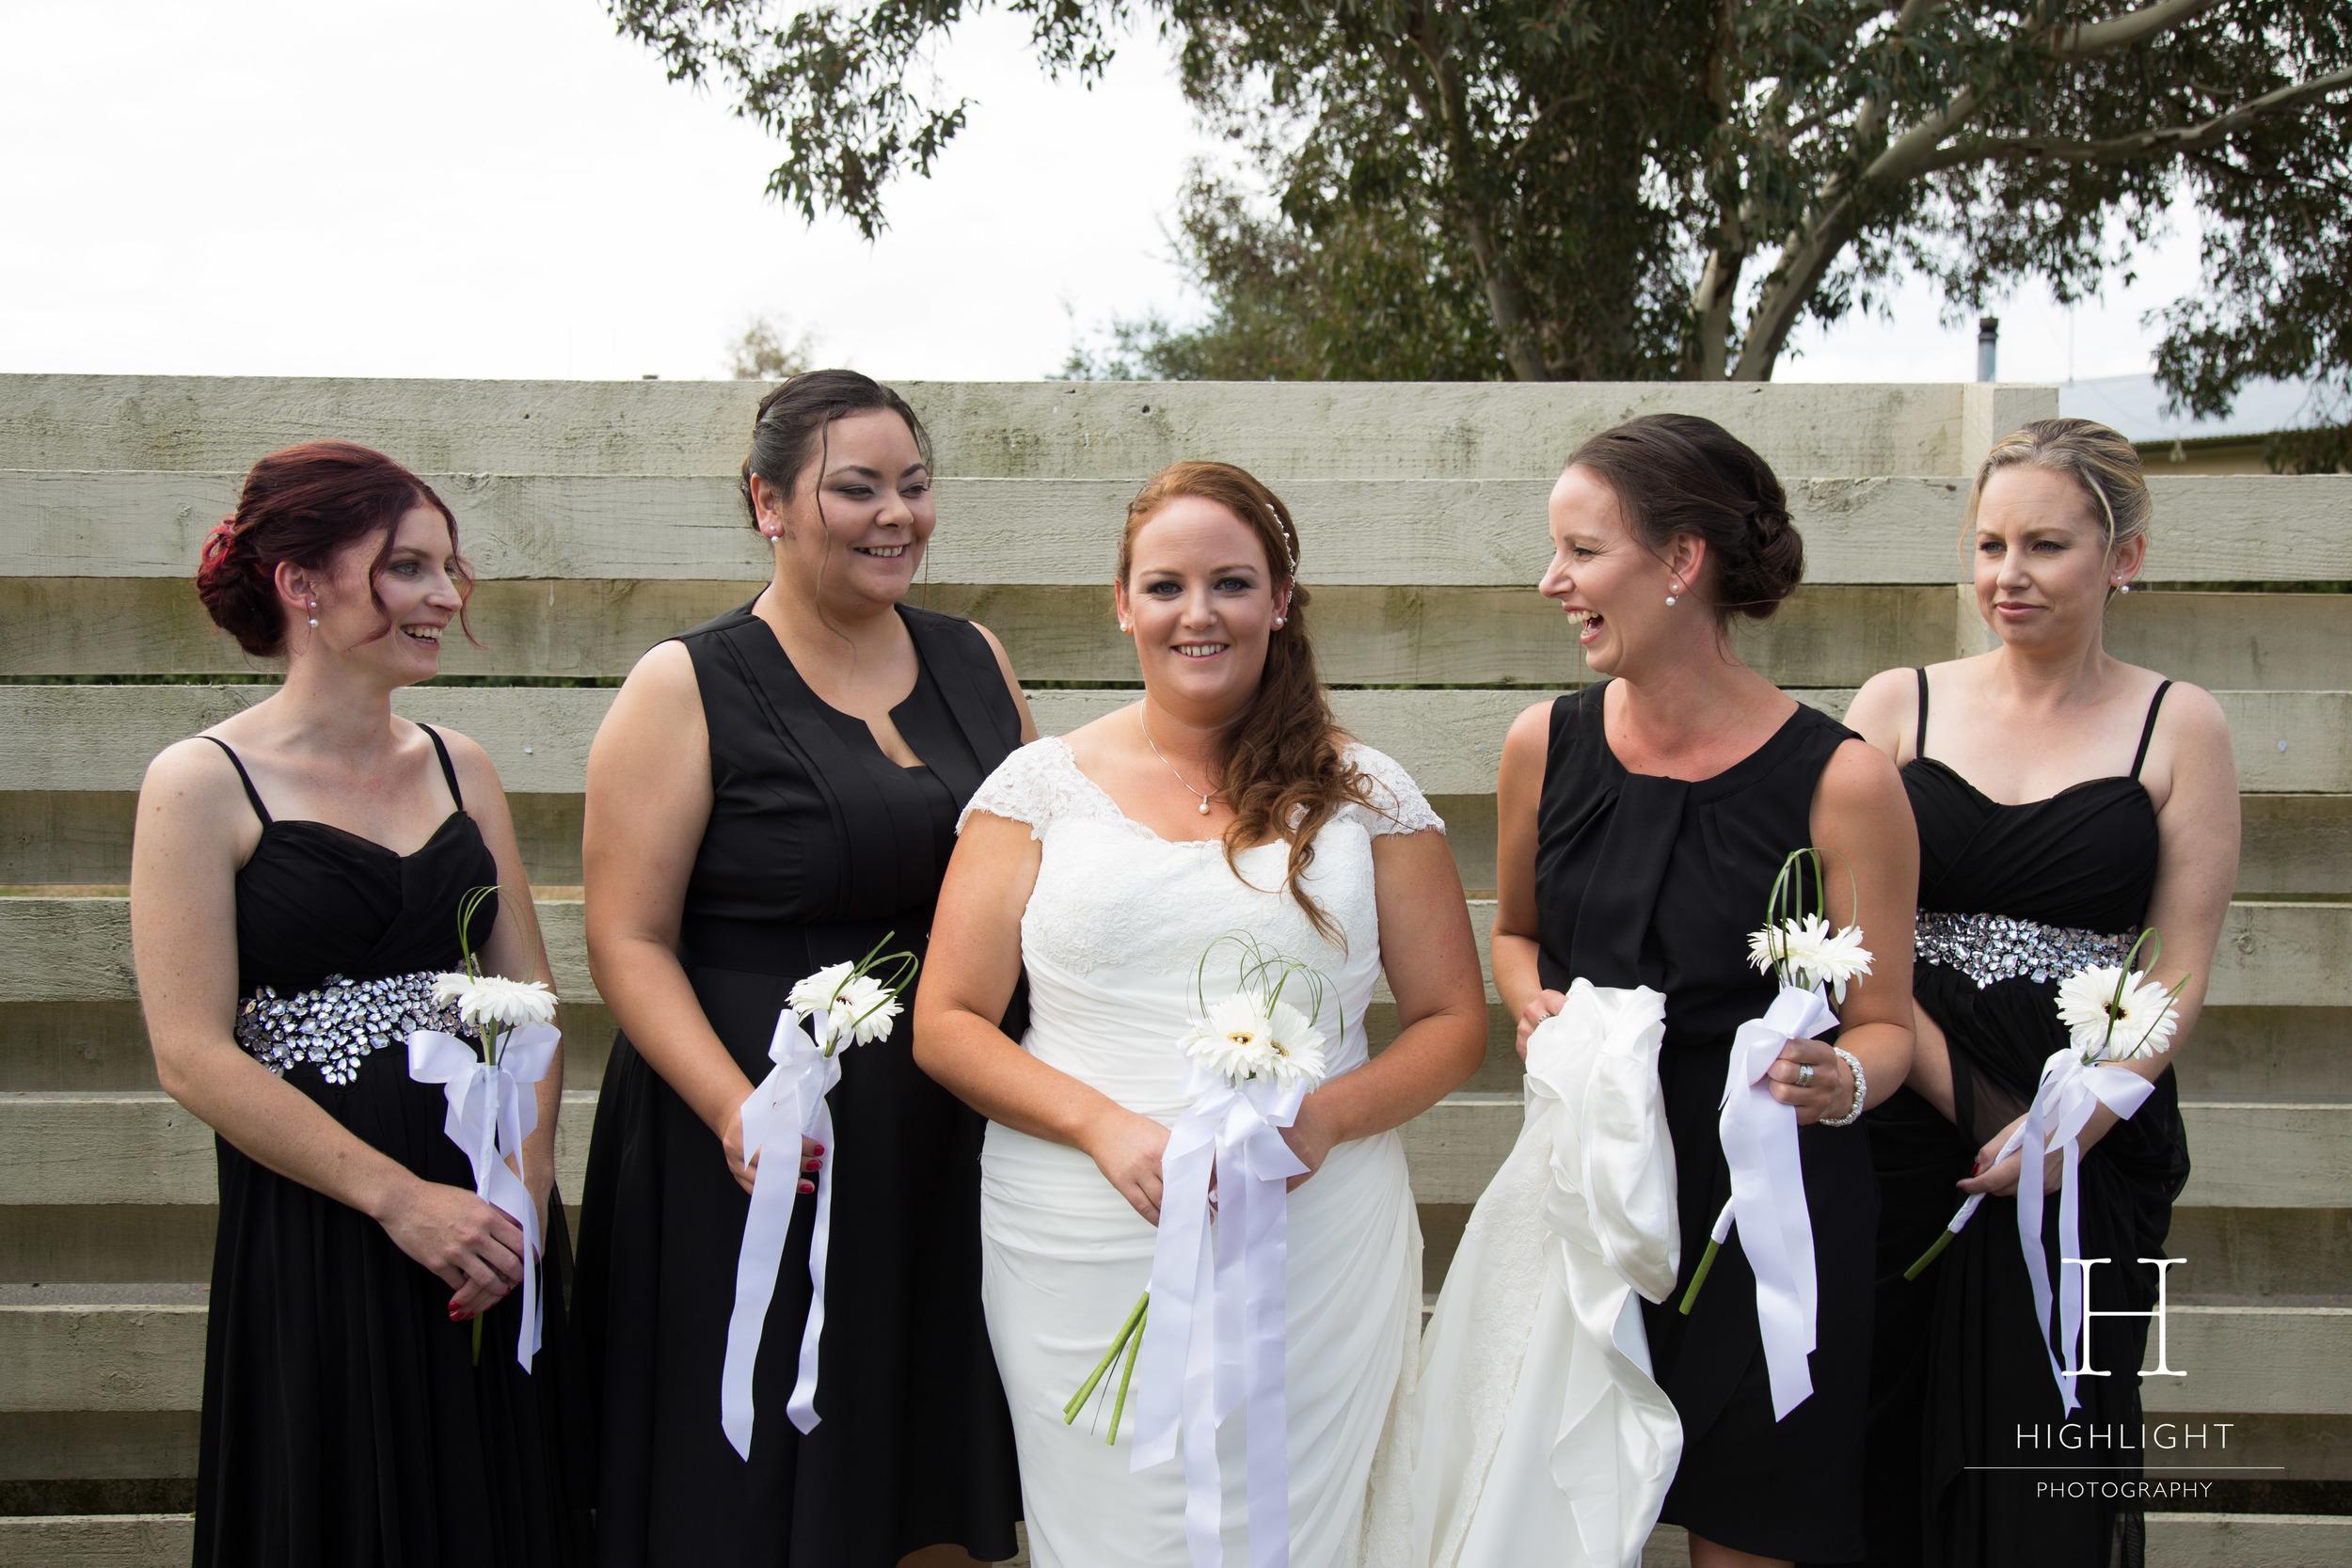 highlight_photography_wedding_new_zealand_bridesmaids.jpg